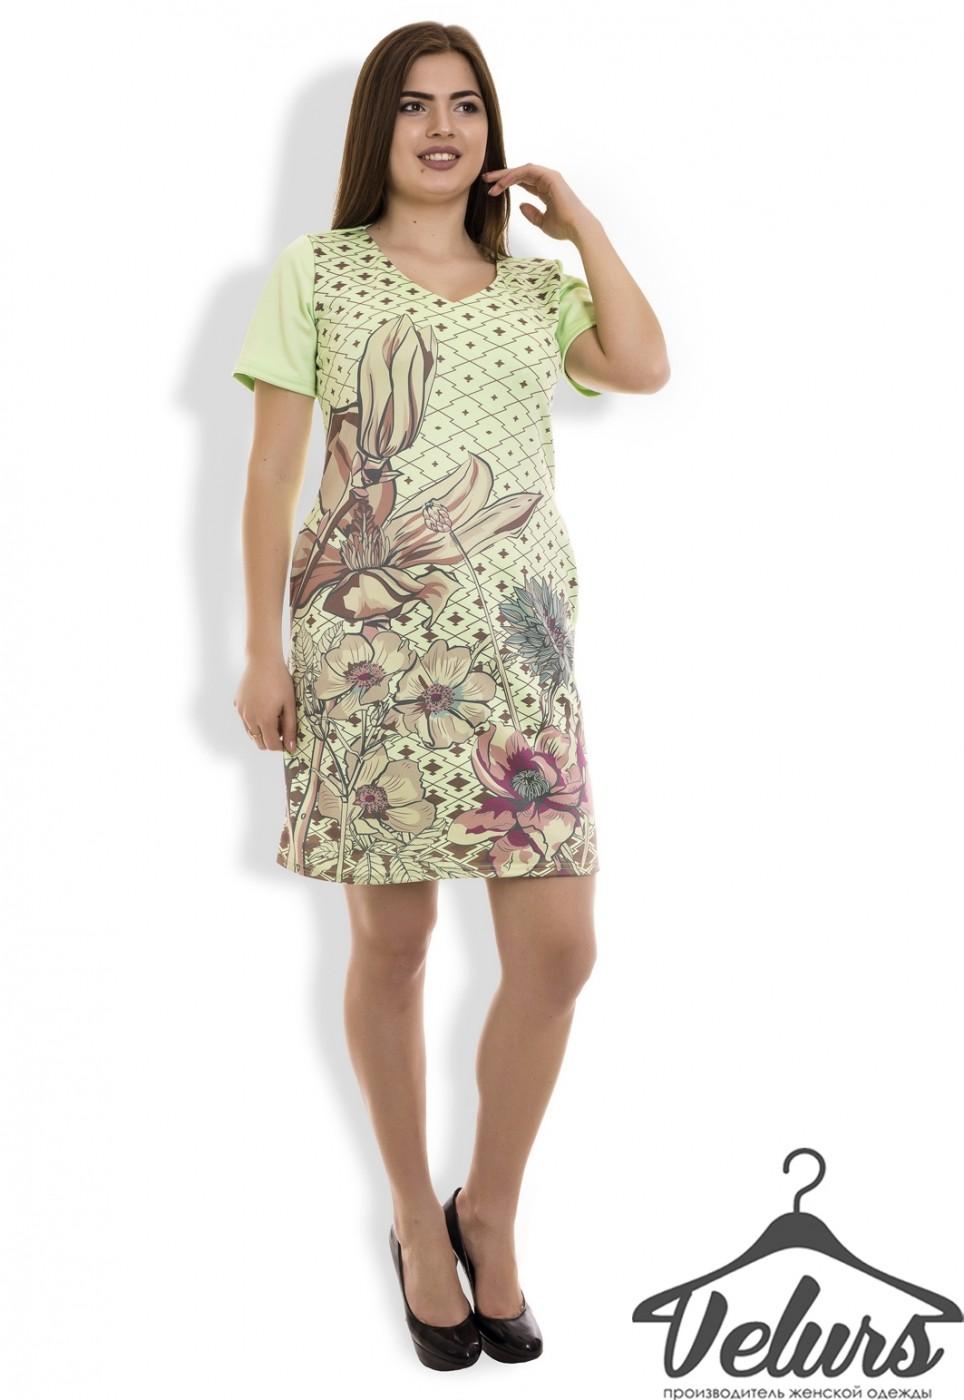 Velurs: Платье 212110 - фото 16